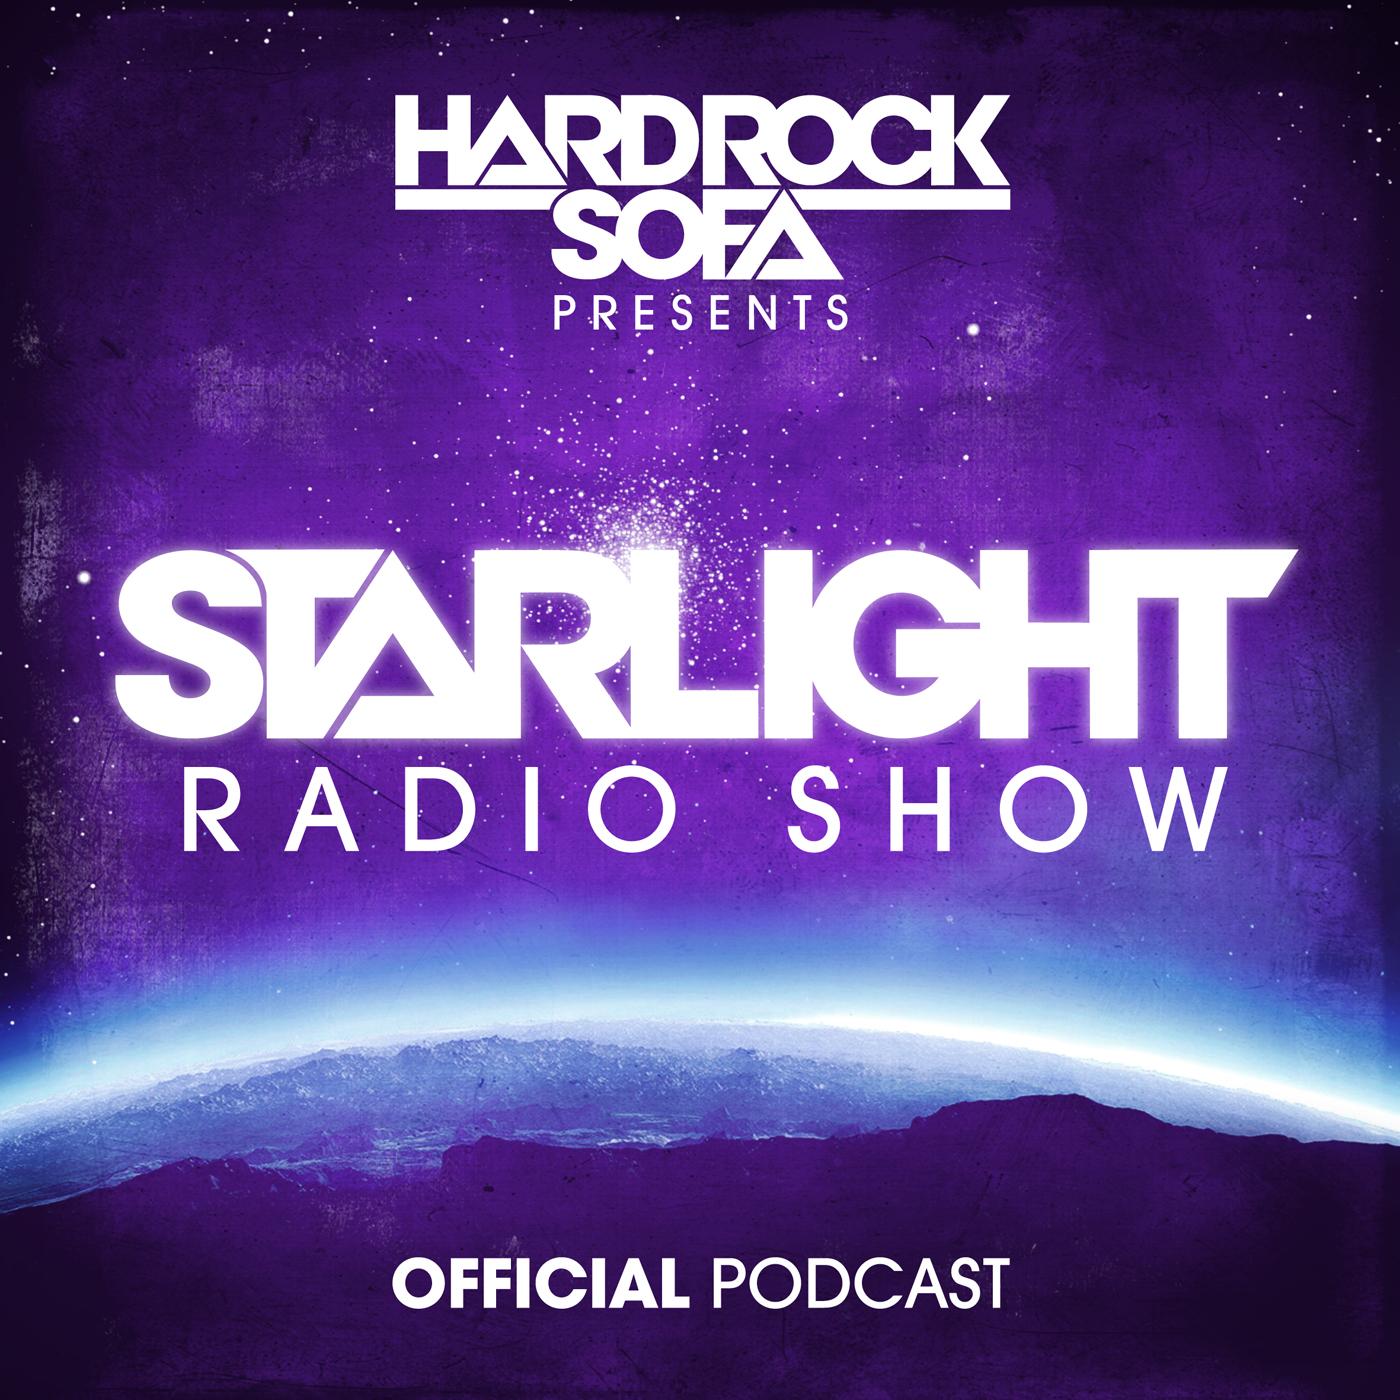 Mixtape: Hard Rock Sofa – Starlight #001